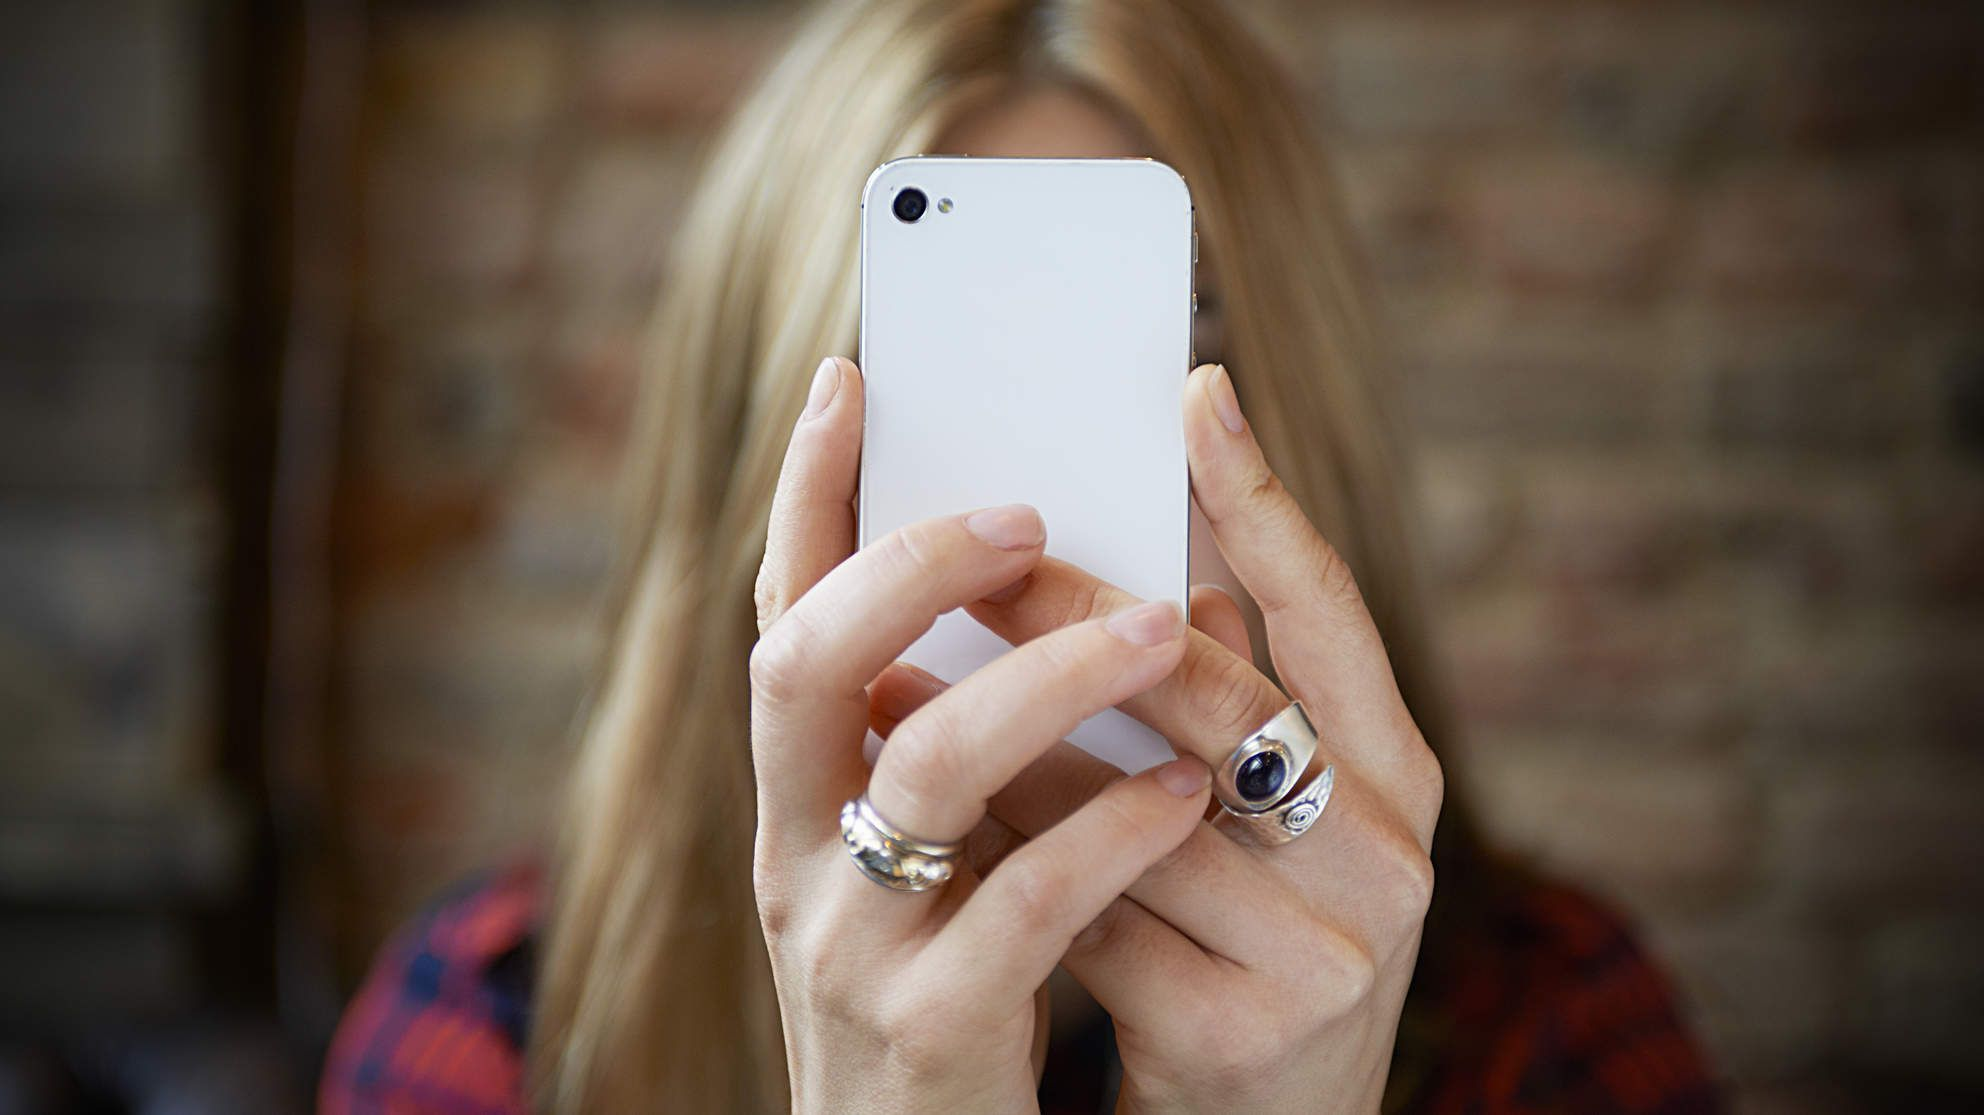 Mobile phone video stream celebrity sex